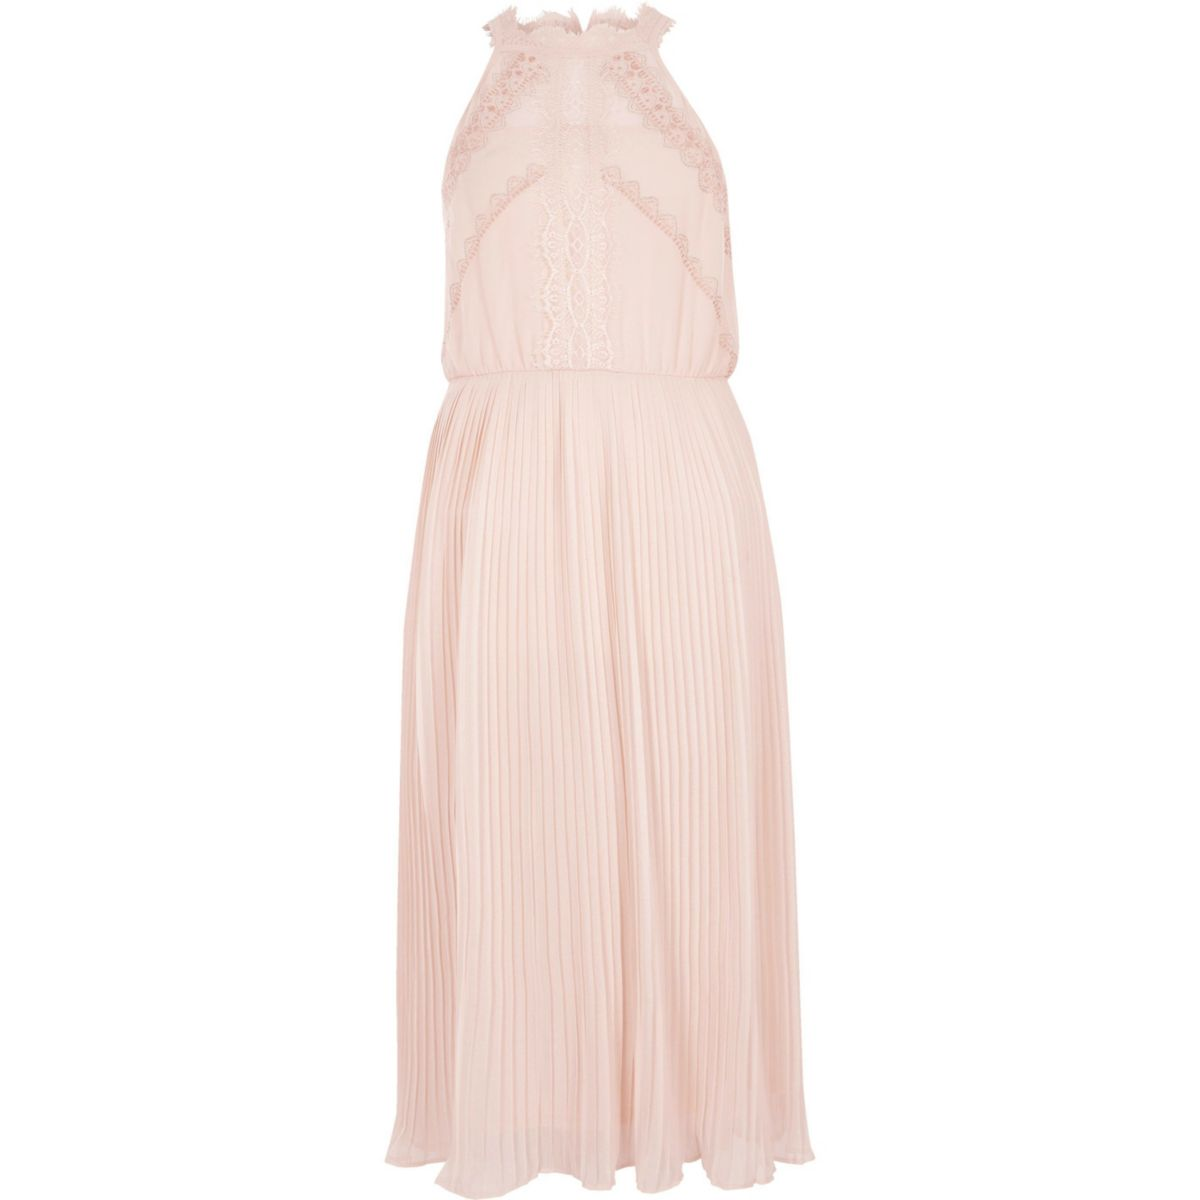 Light beige sleeveless lace midi dress